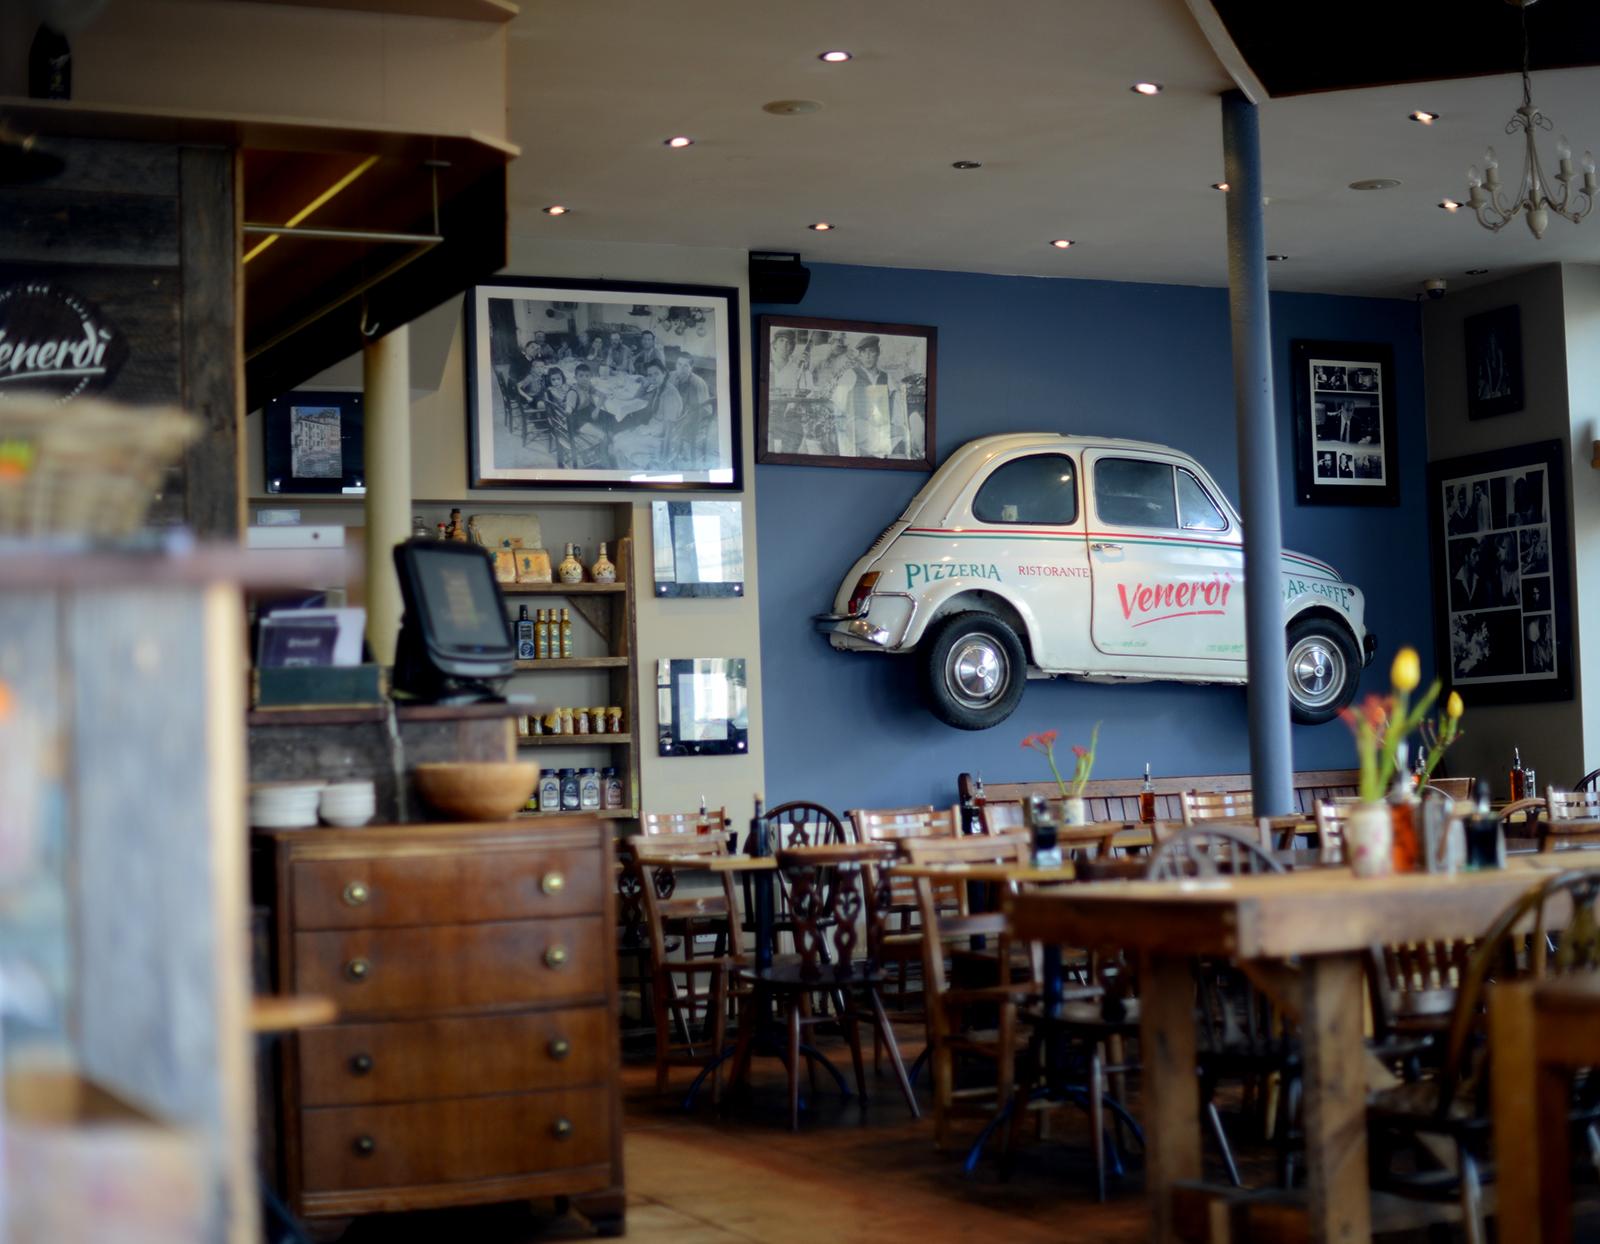 clapton shopping guide with lifestyle bloggers sara delaney and julia rebaudo featuring venerdi restaurant